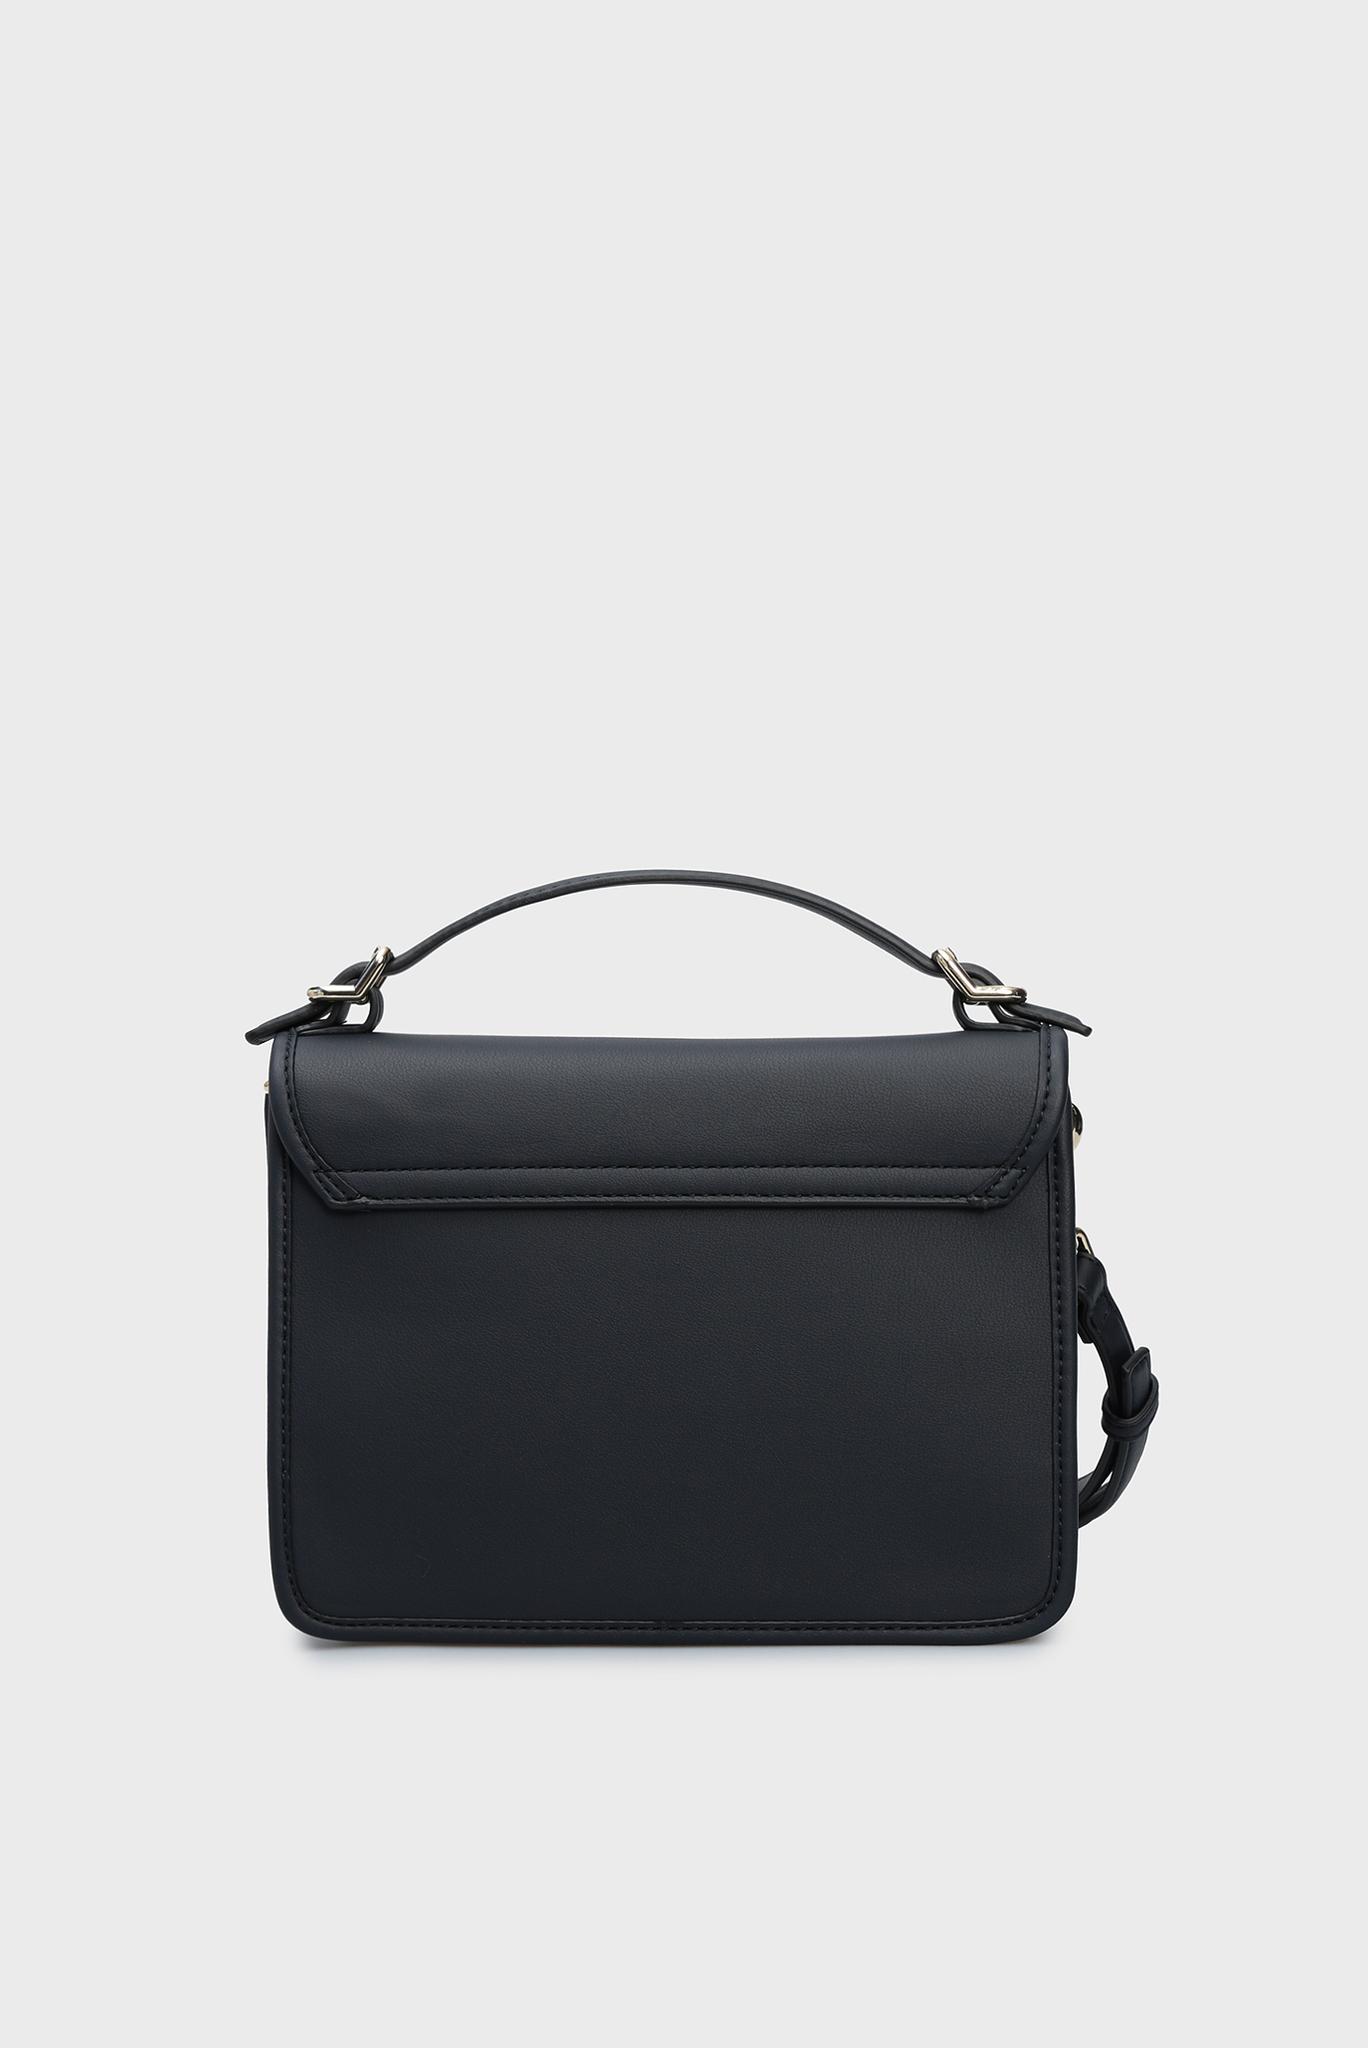 Женская темно-синяя сумка через плечо CHIC CROSSOVER Tommy Hilfiger